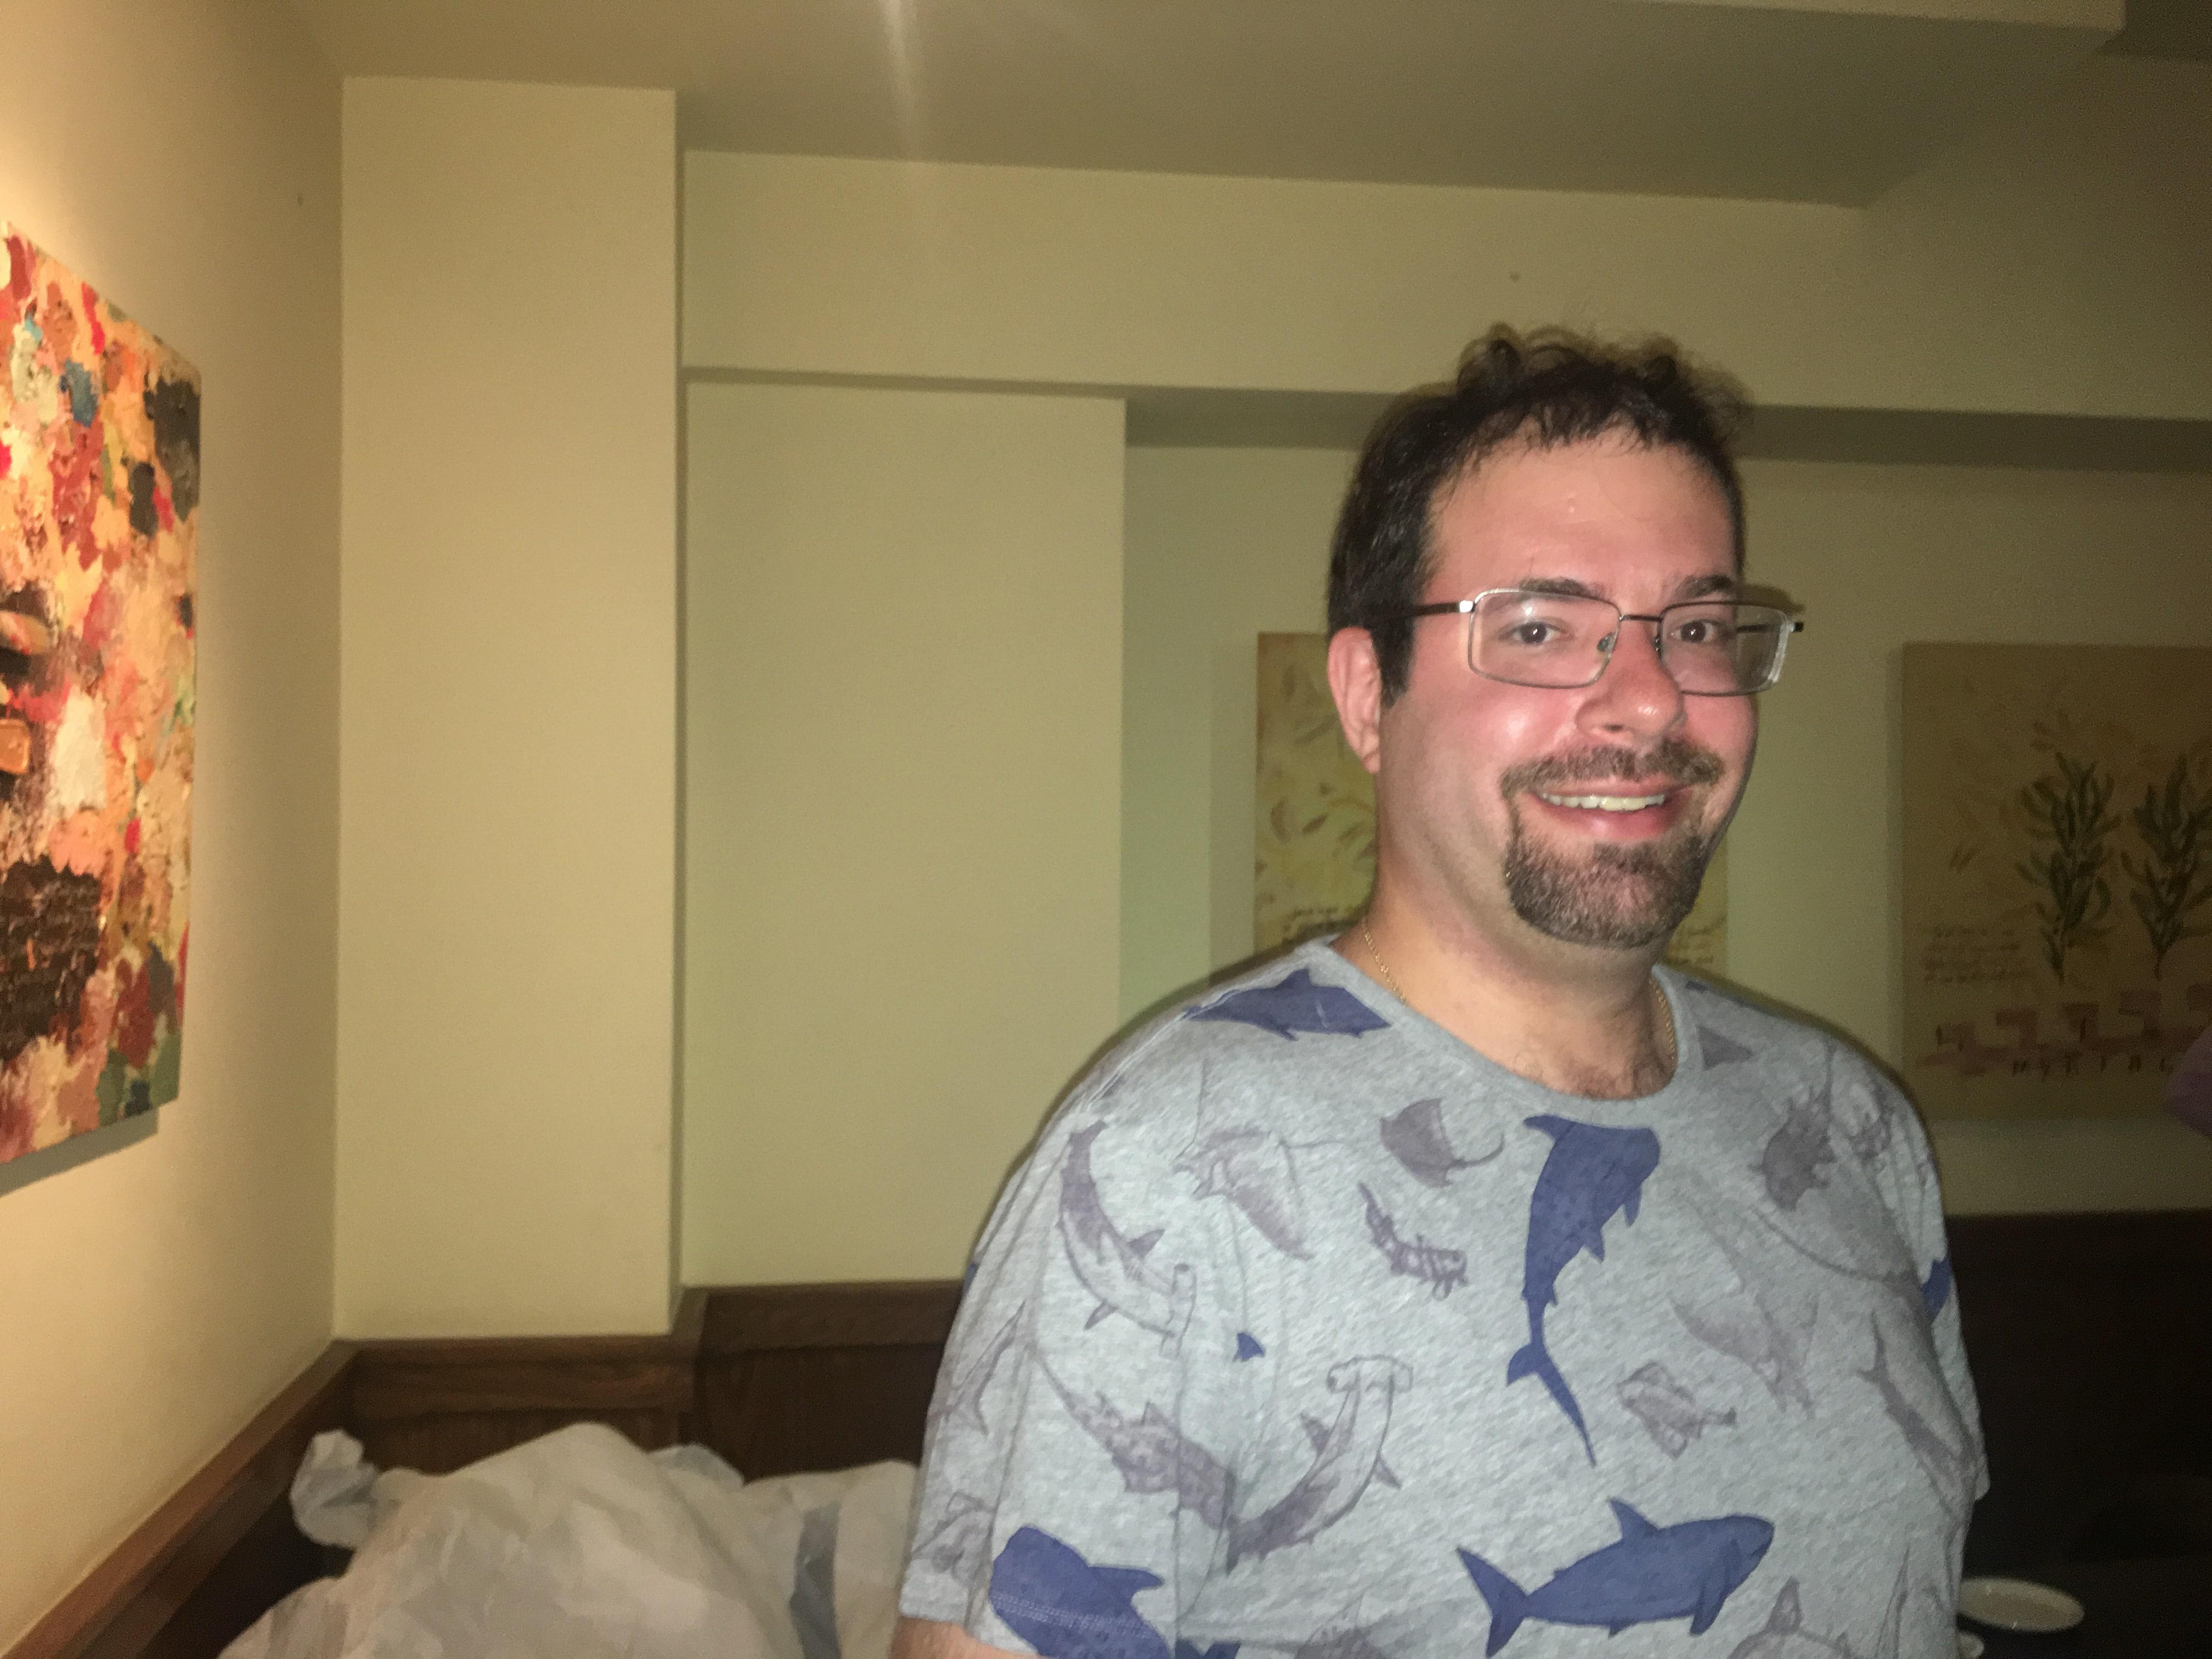 Marine biologist and shark advocate Dr. David Shiffman